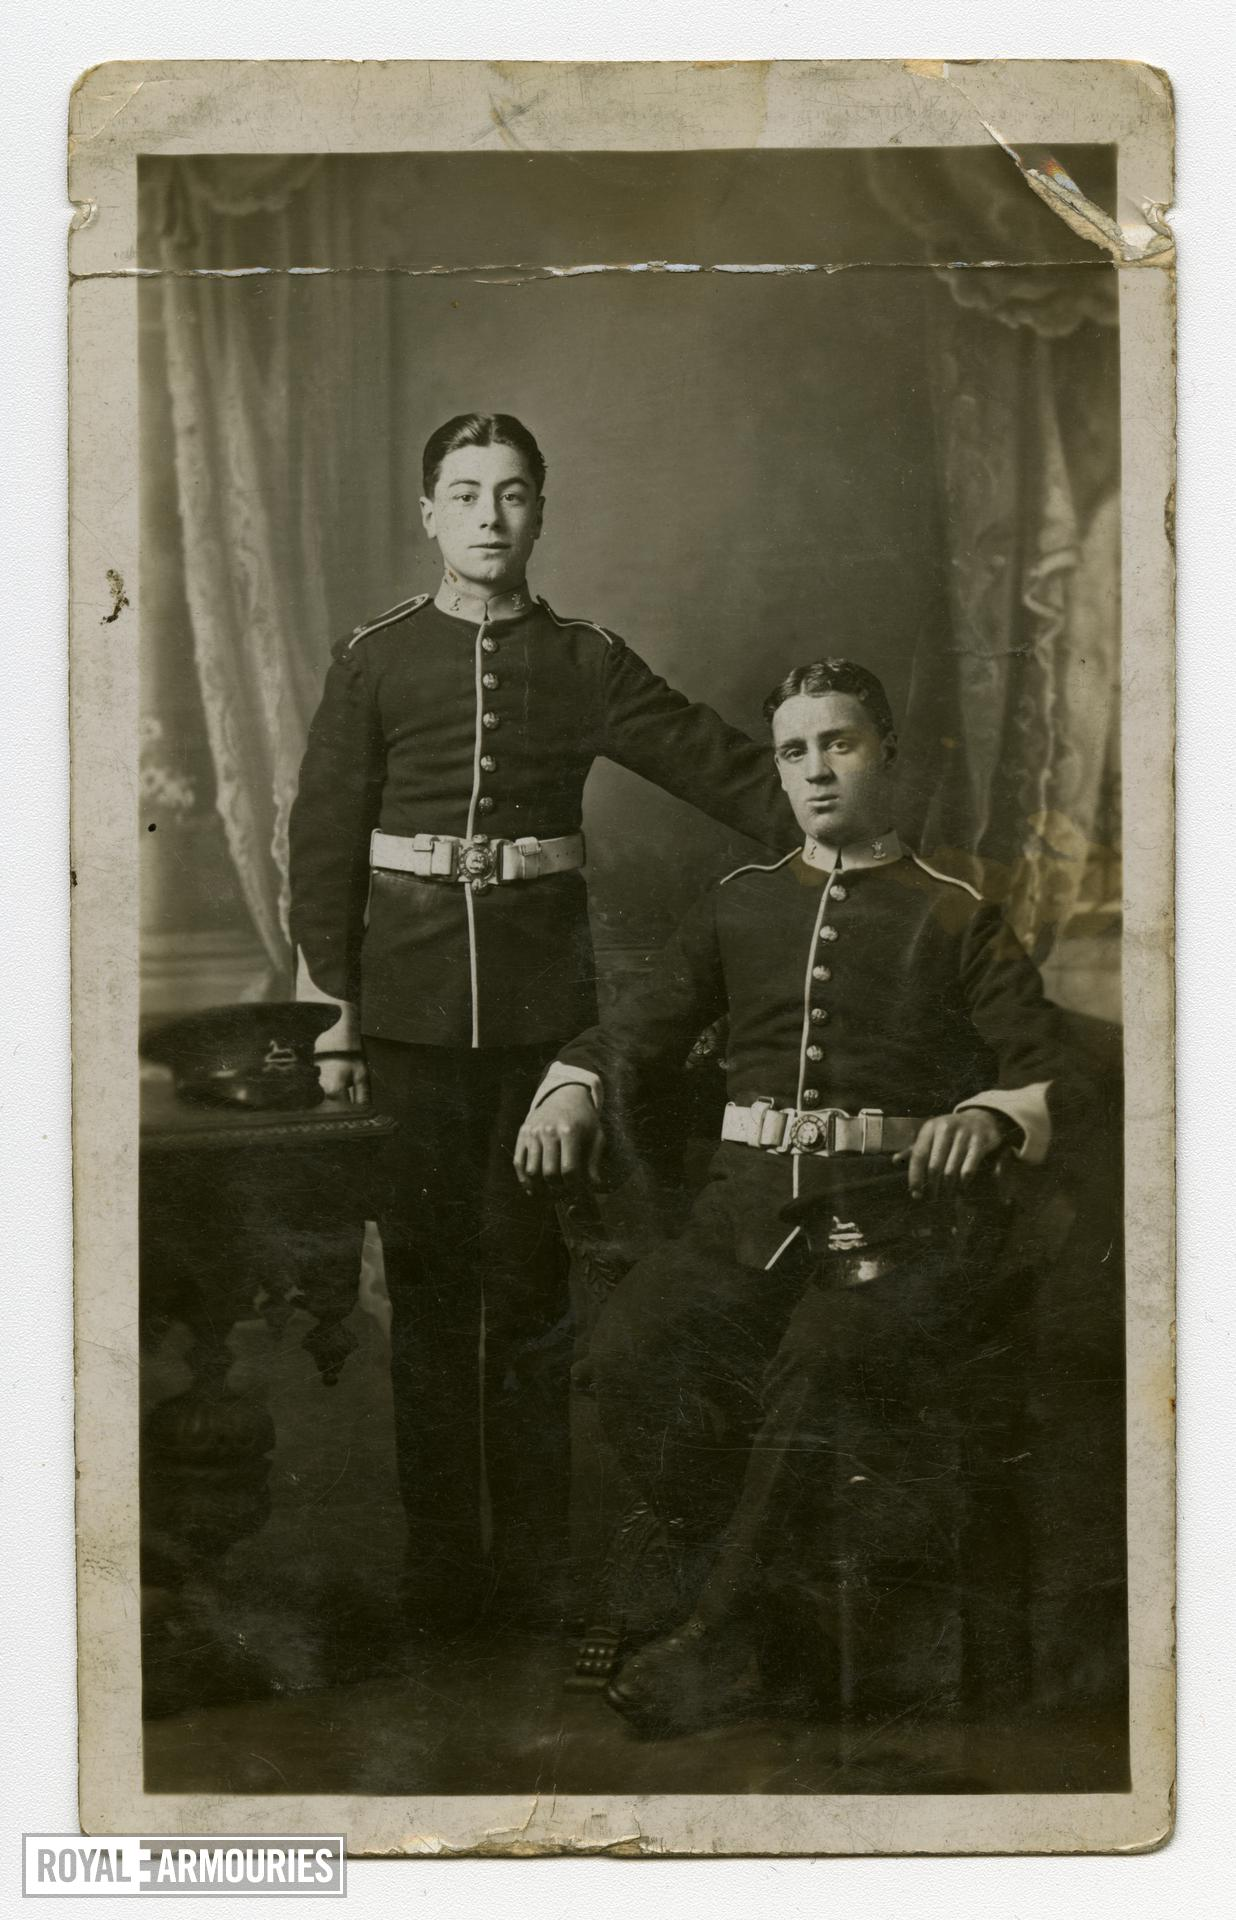 Photograph of Lance Sergeant Thomas Queenan and colleague in dress uniform, 1st West Yorkshire regiment. (XVIII.461)